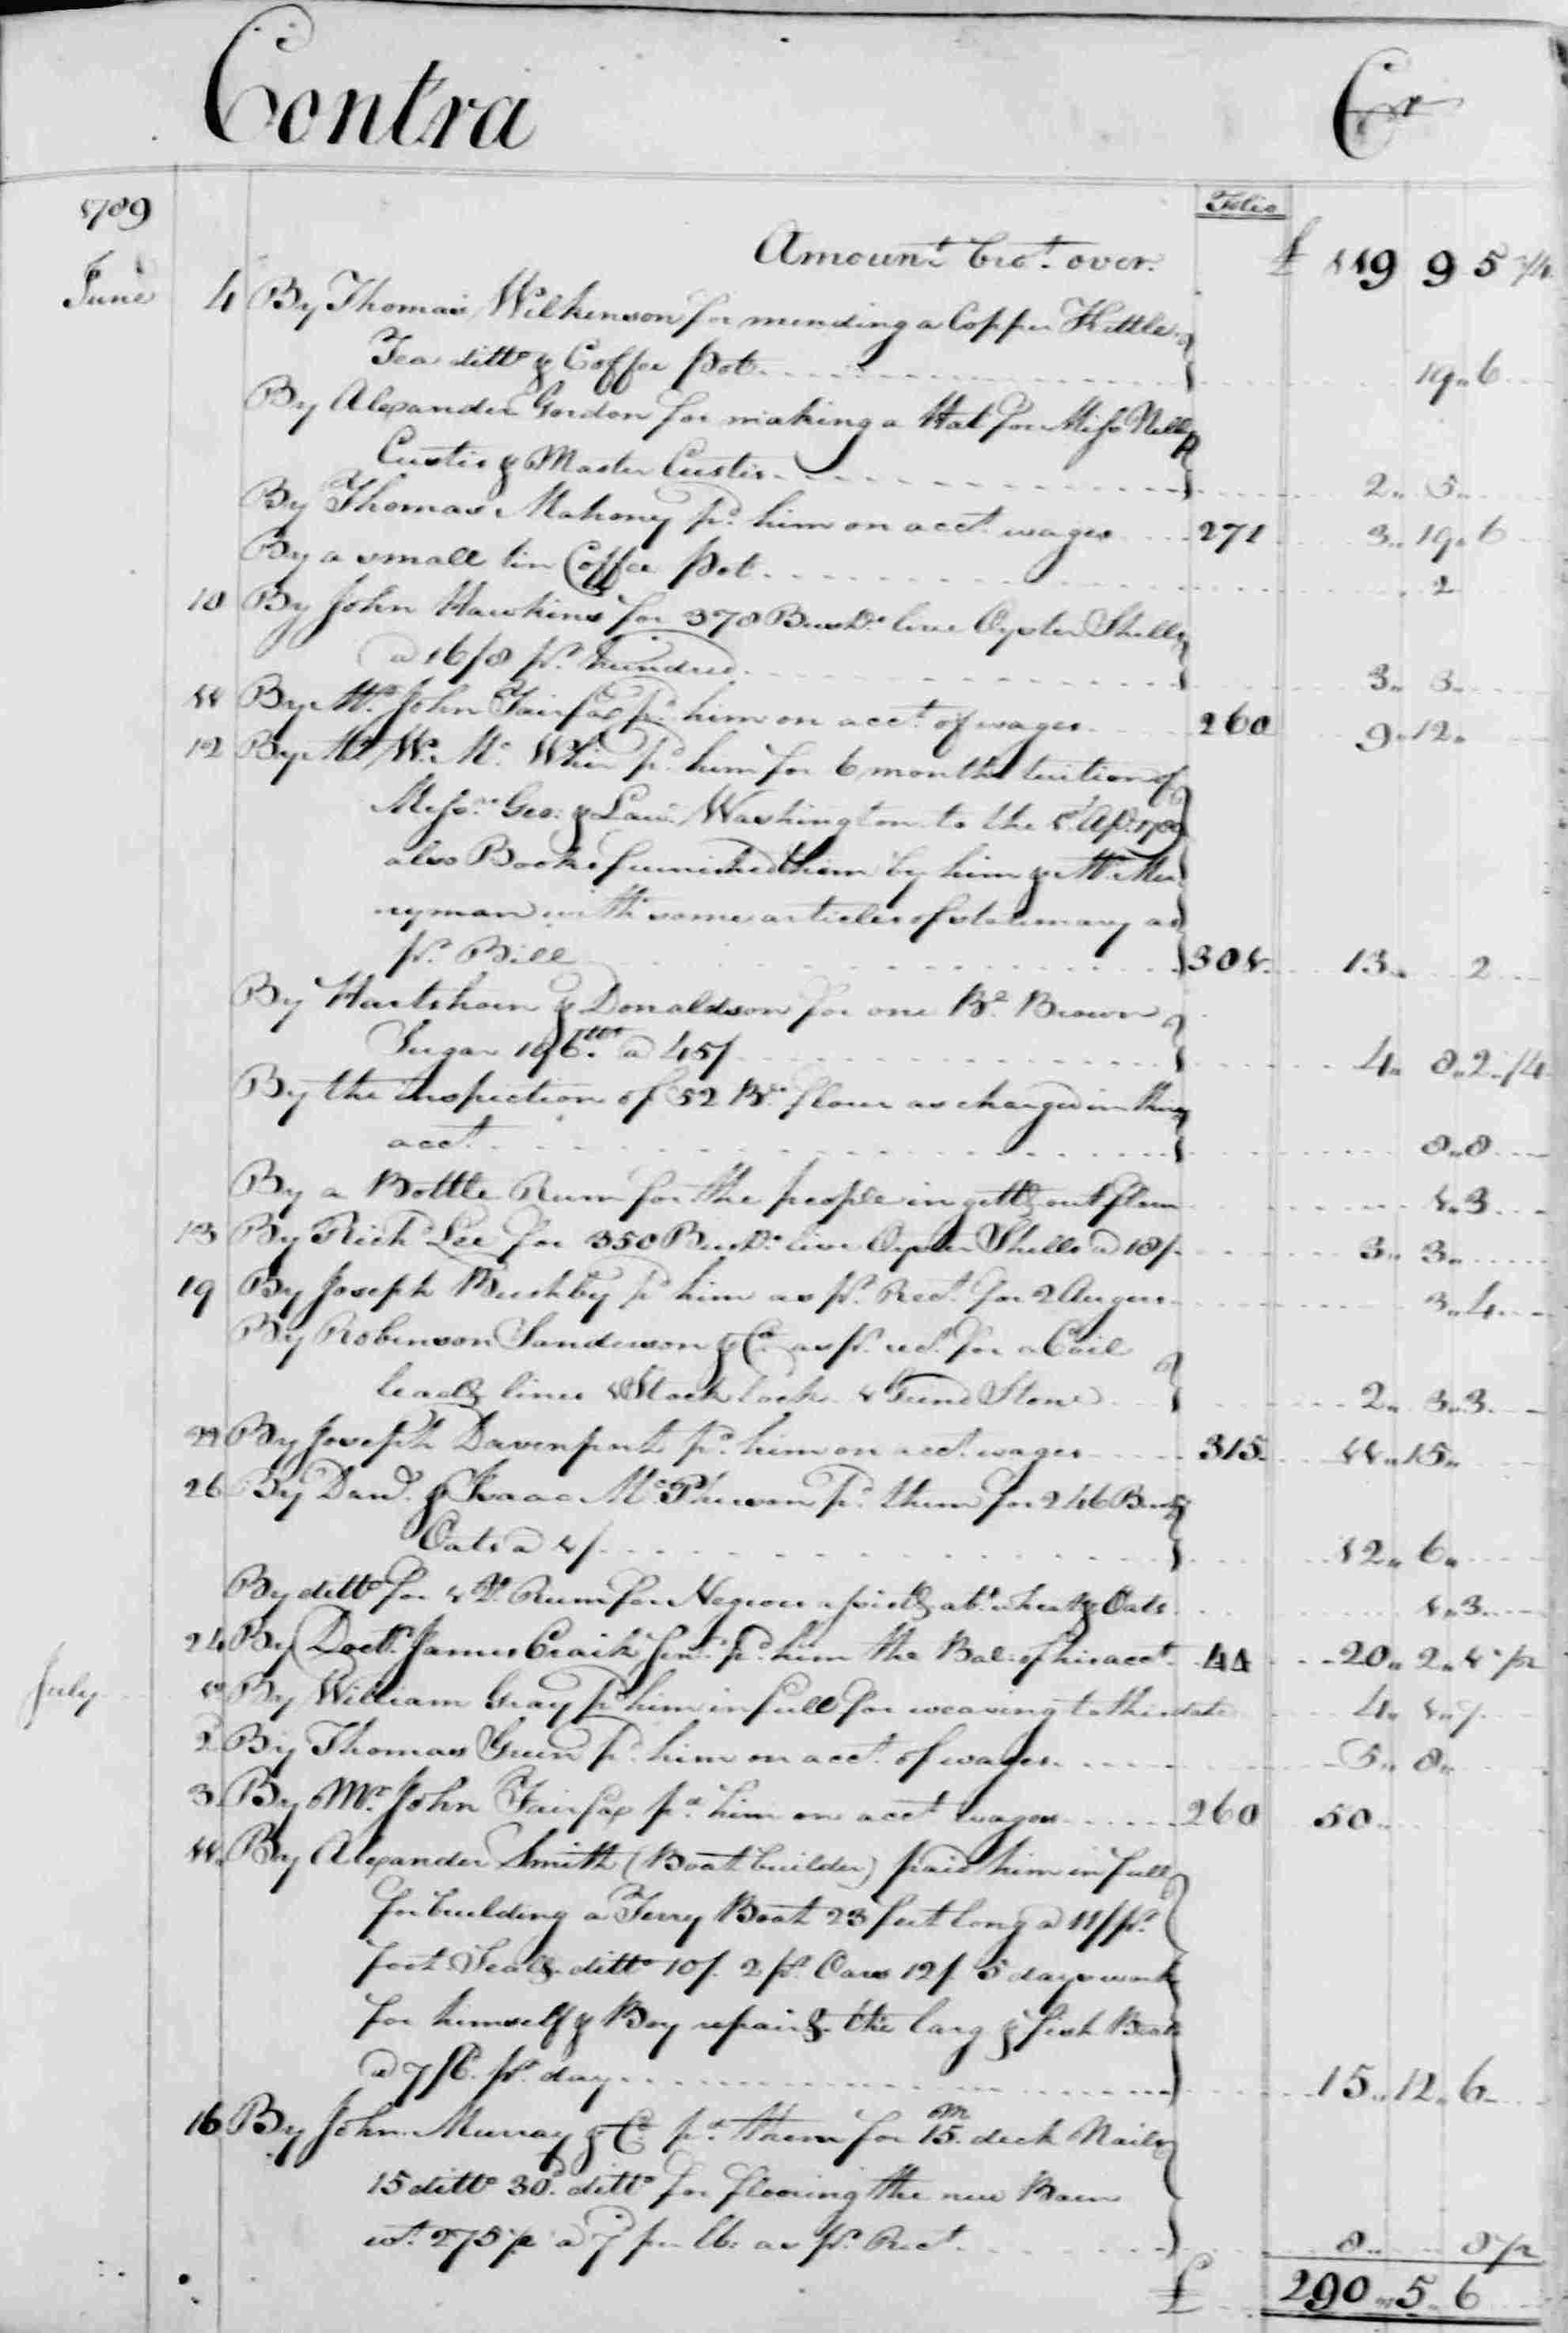 Ledger B, folio 305, right side